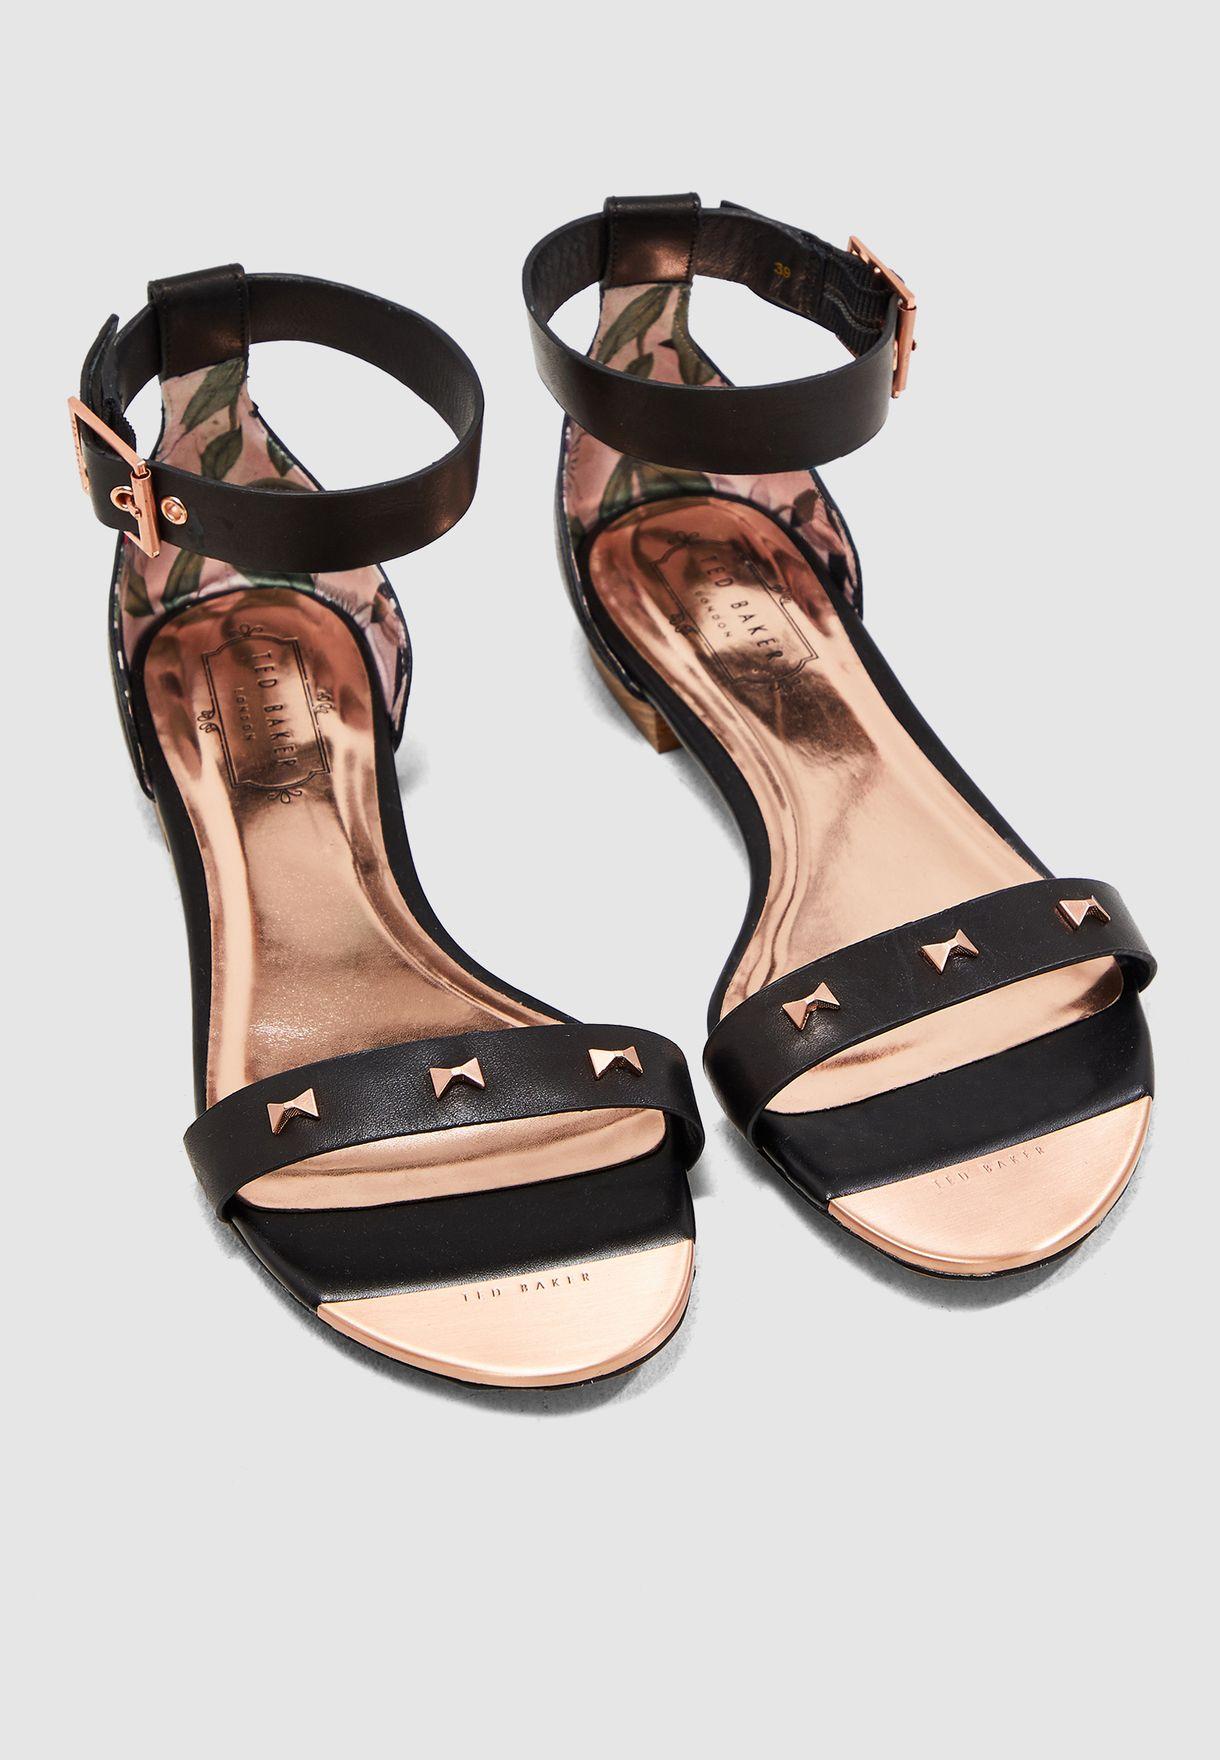 Ovey Sandal